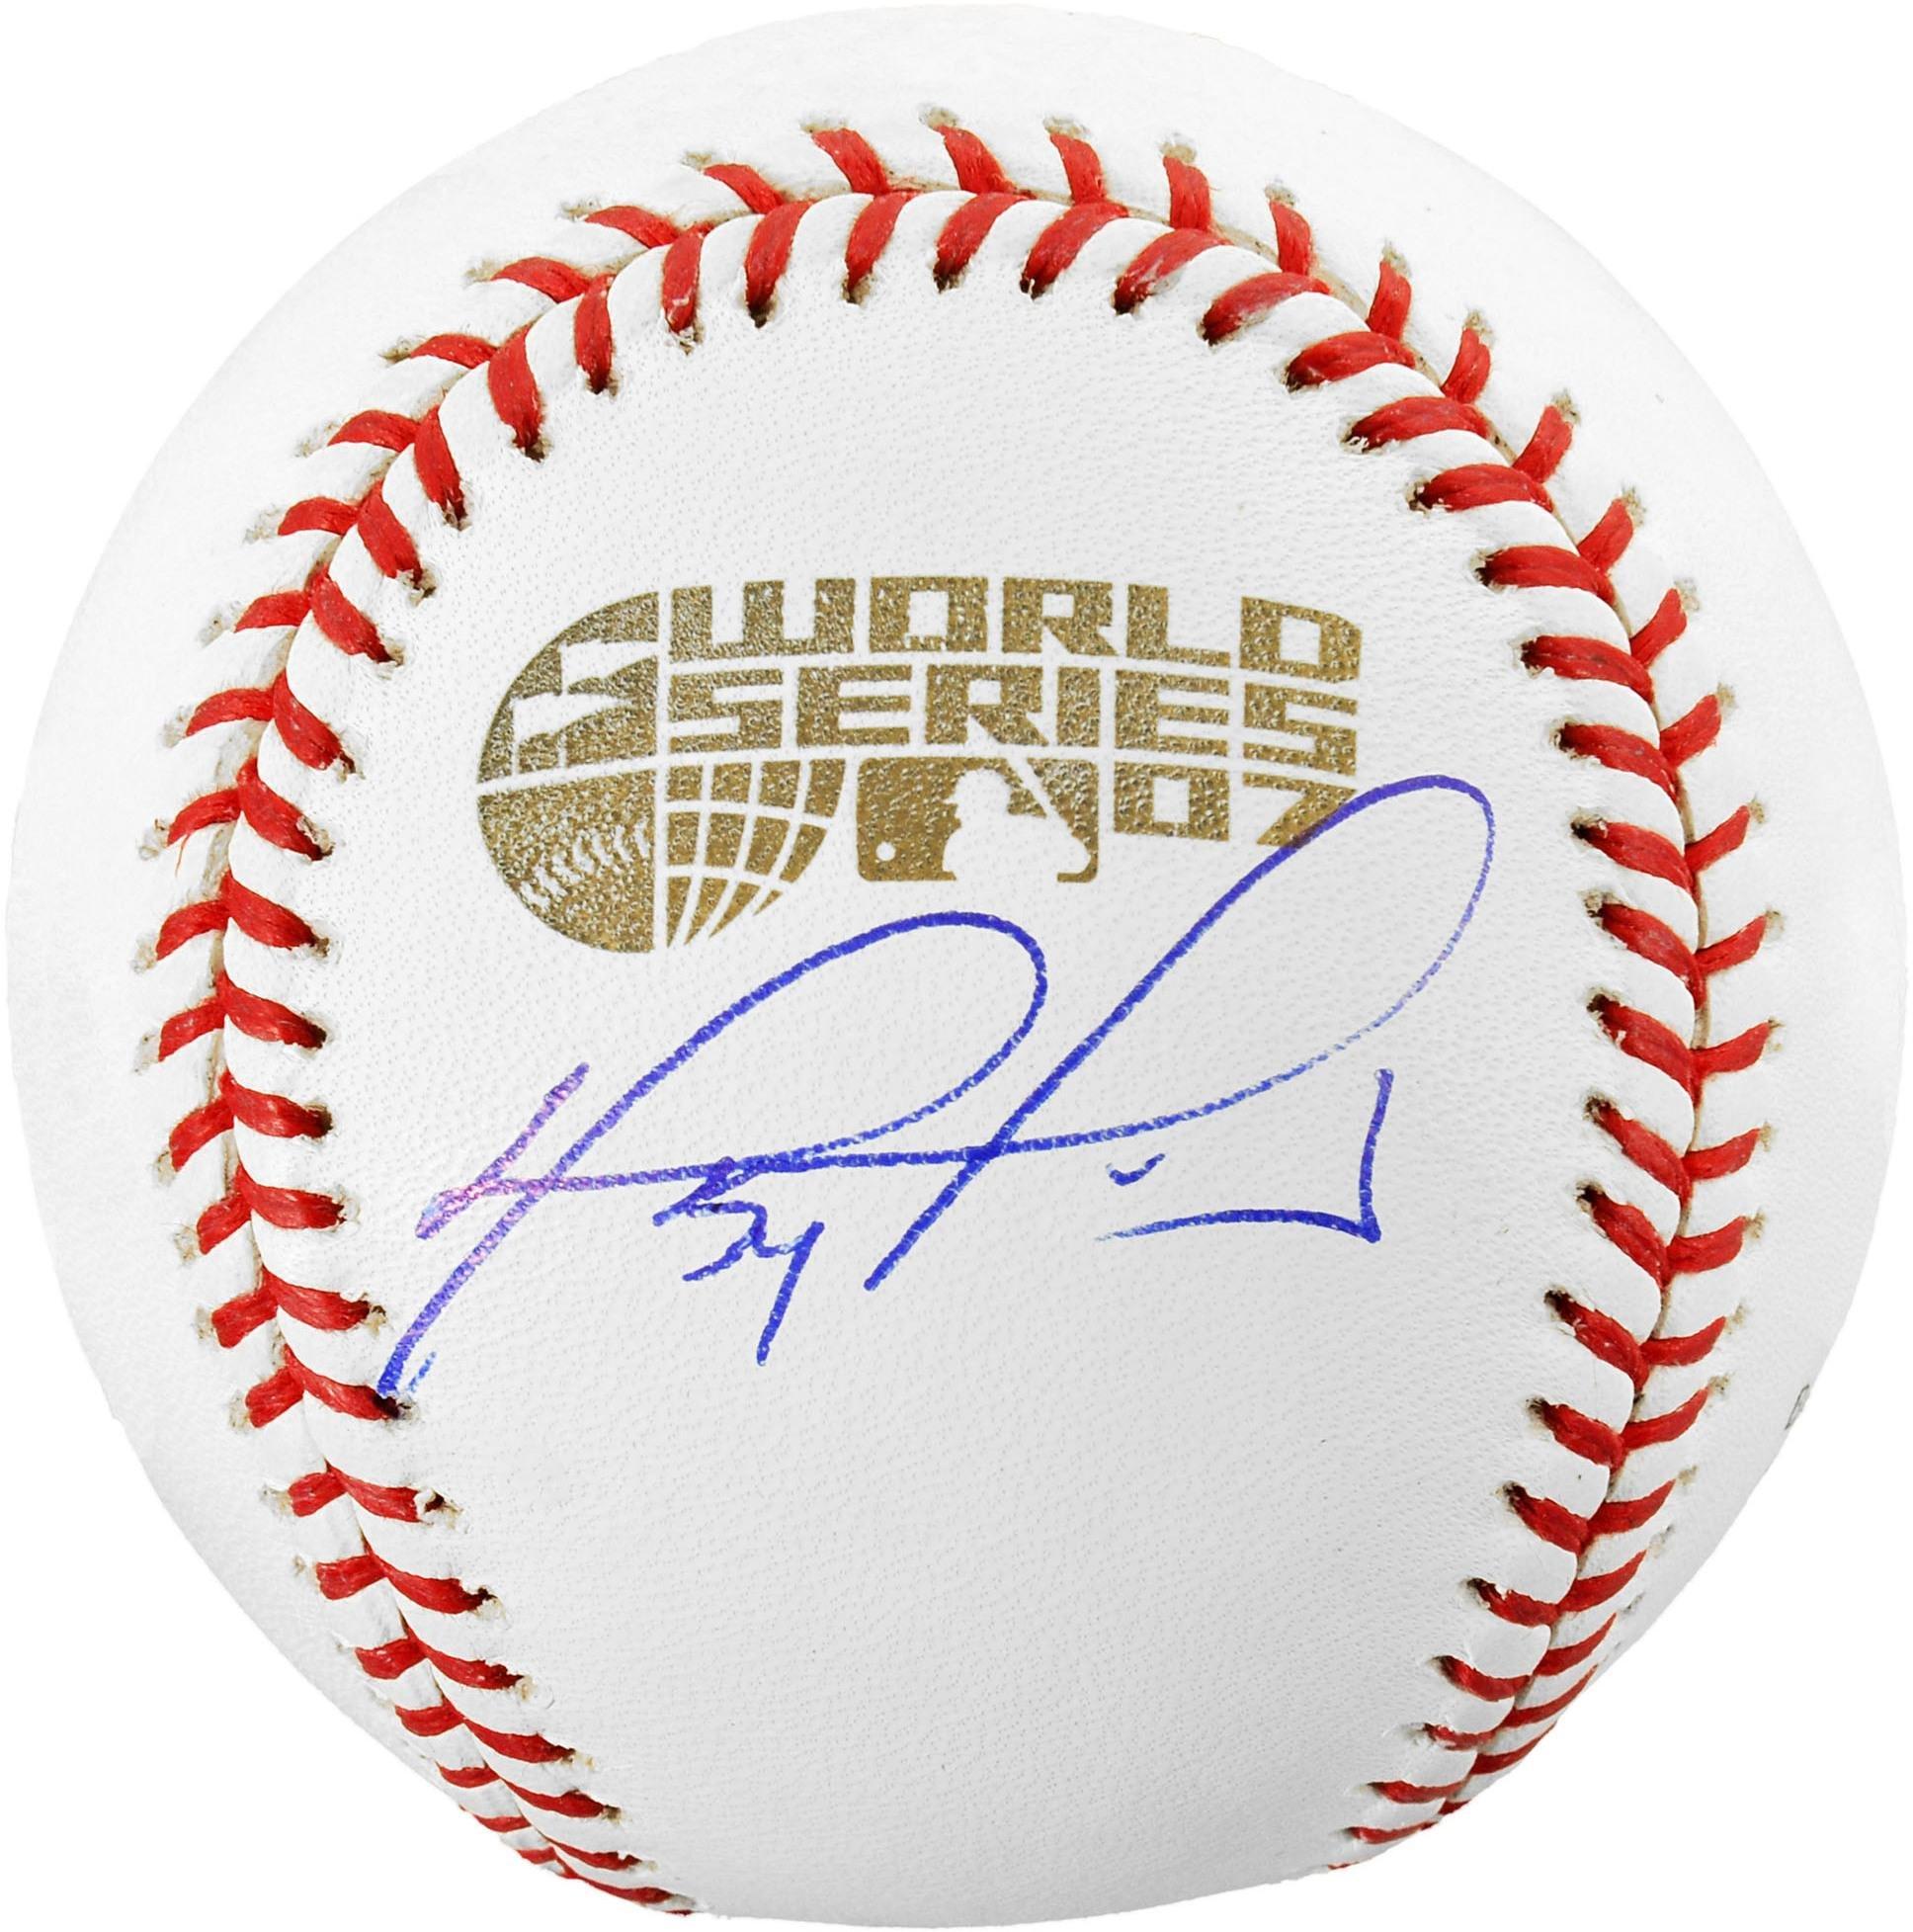 David Ortiz Boston Red Sox 2007 World Series Autographed Baseball Fanatics Authentic Certified Autographed Baseballs